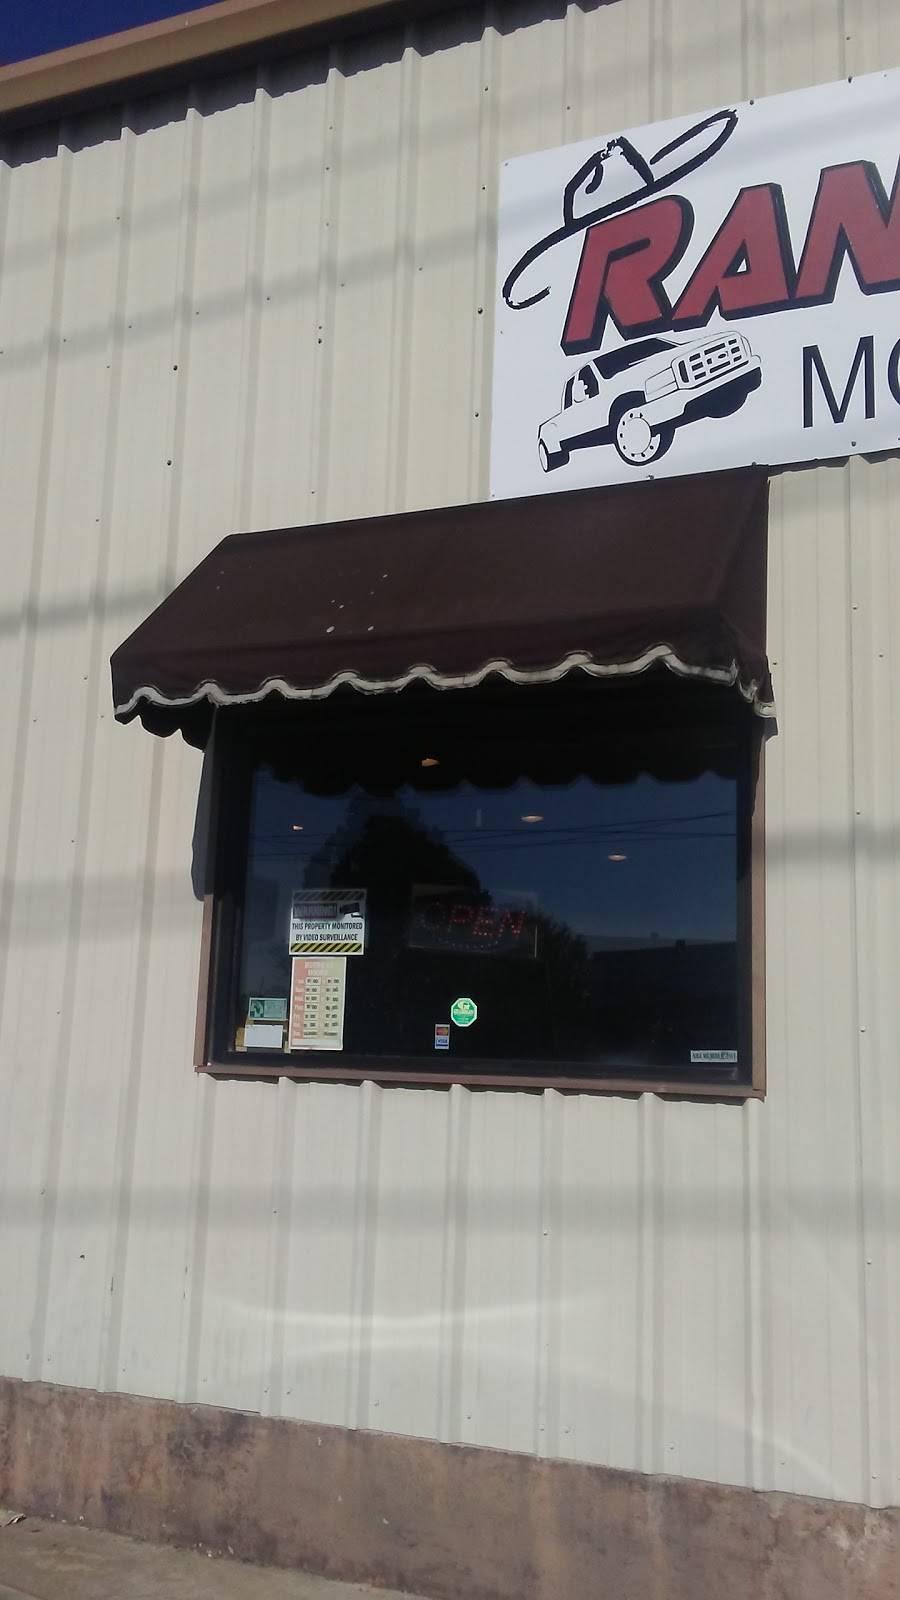 Pine Street Auto Recyclers & Salvage Inc - car repair  | Photo 6 of 10 | Address: 1561 E Pine St, Tulsa, OK 74106, USA | Phone: (918) 794-7770